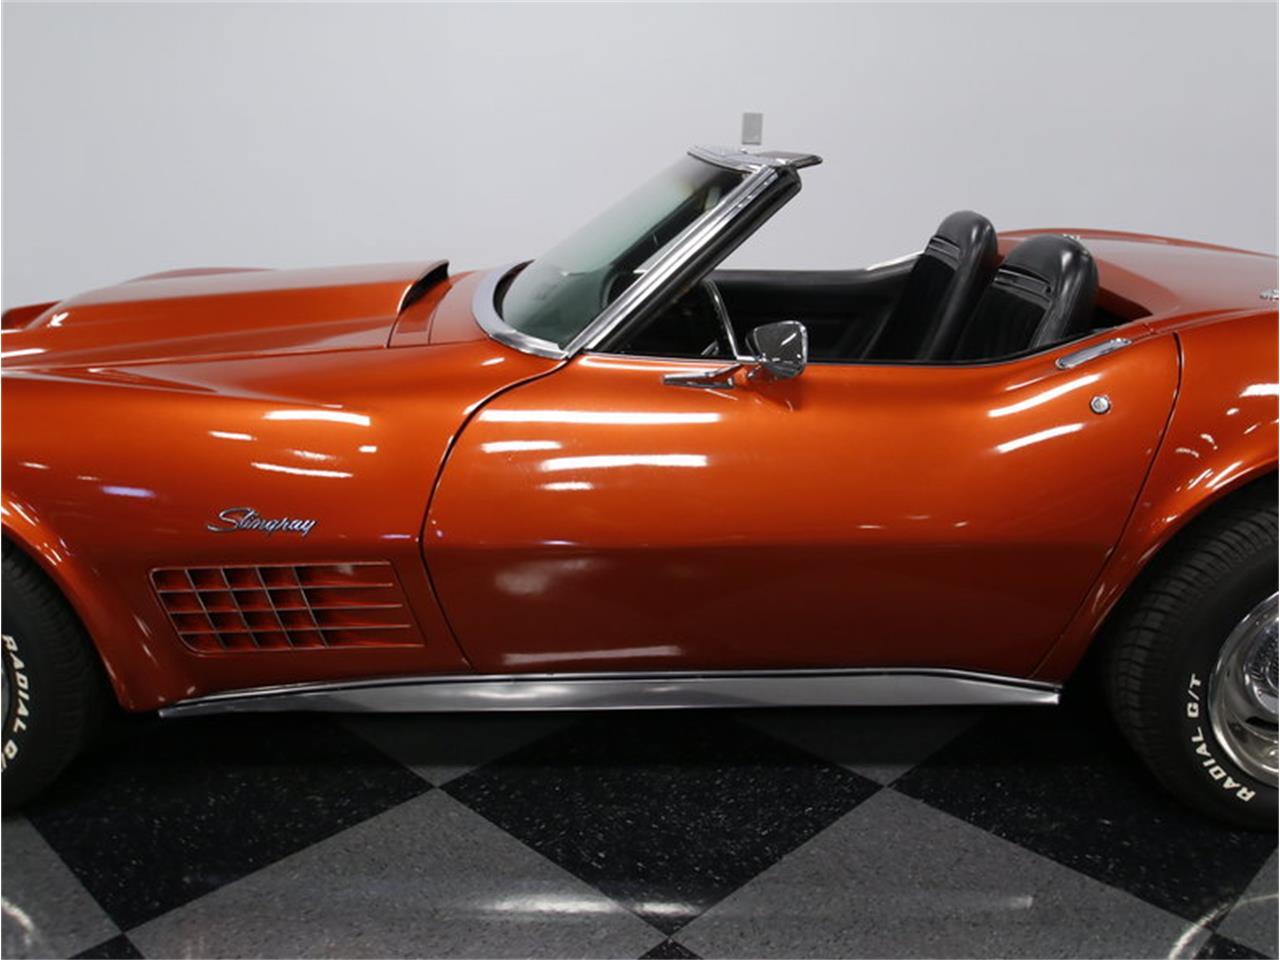 Large Picture of Classic 1970 Chevrolet Corvette located in Concord North Carolina - $27,995.00 Offered by Streetside Classics - Charlotte - JTQZ